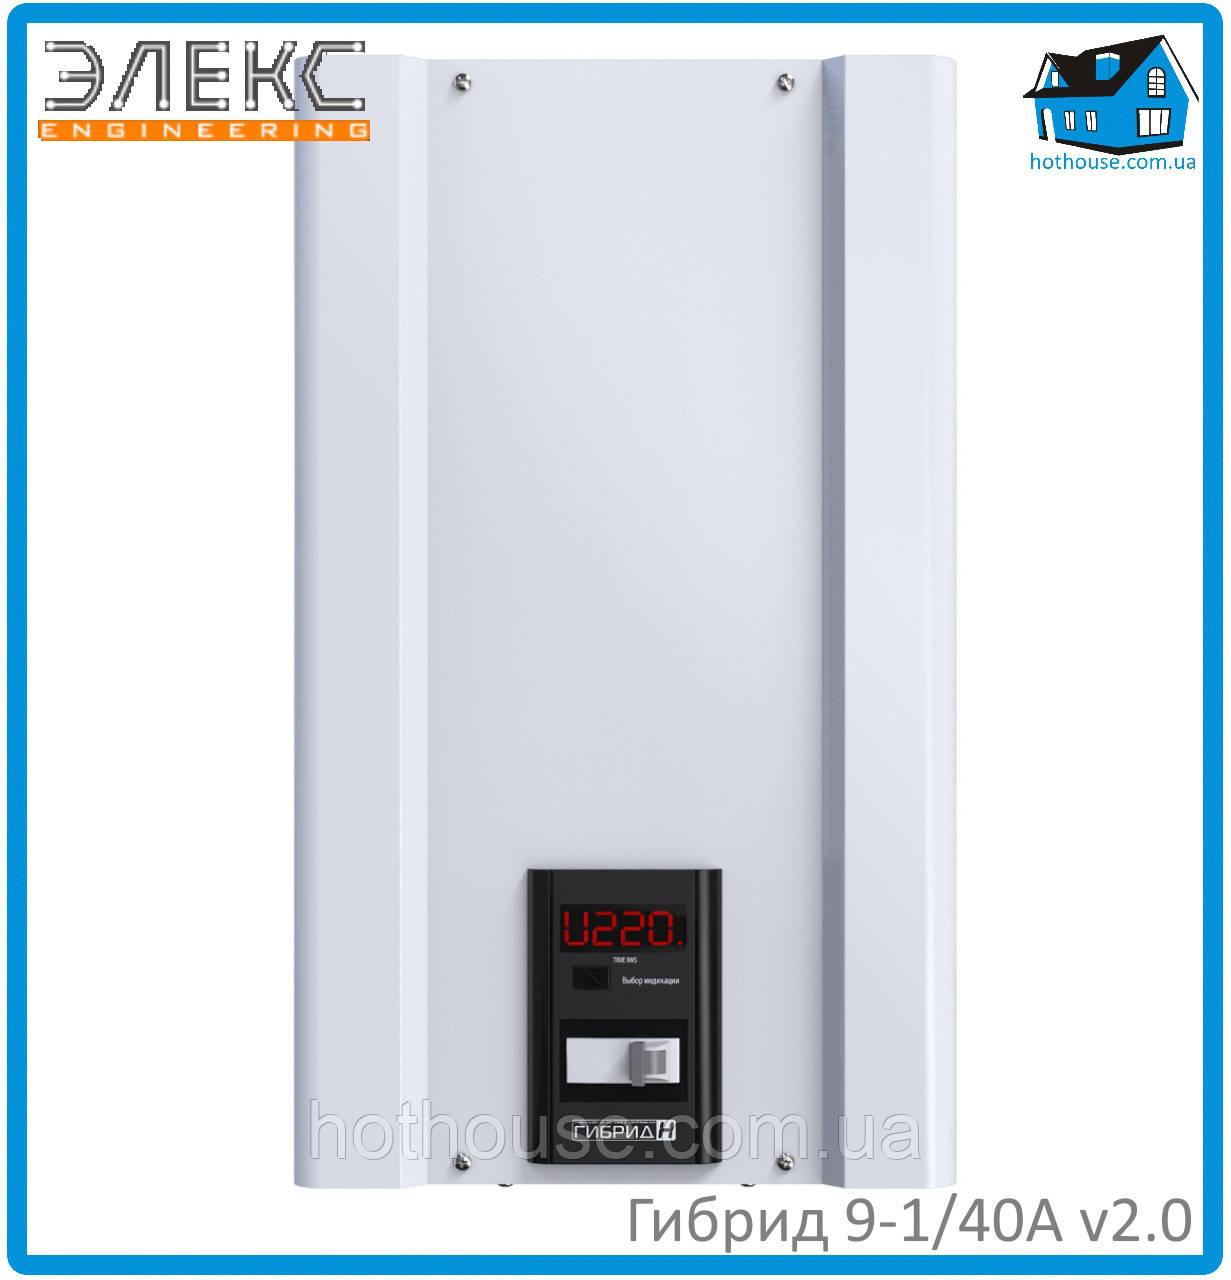 Стабилизатор напряжения ЭЛЕКС Гибрид 9-1/40A v2.0